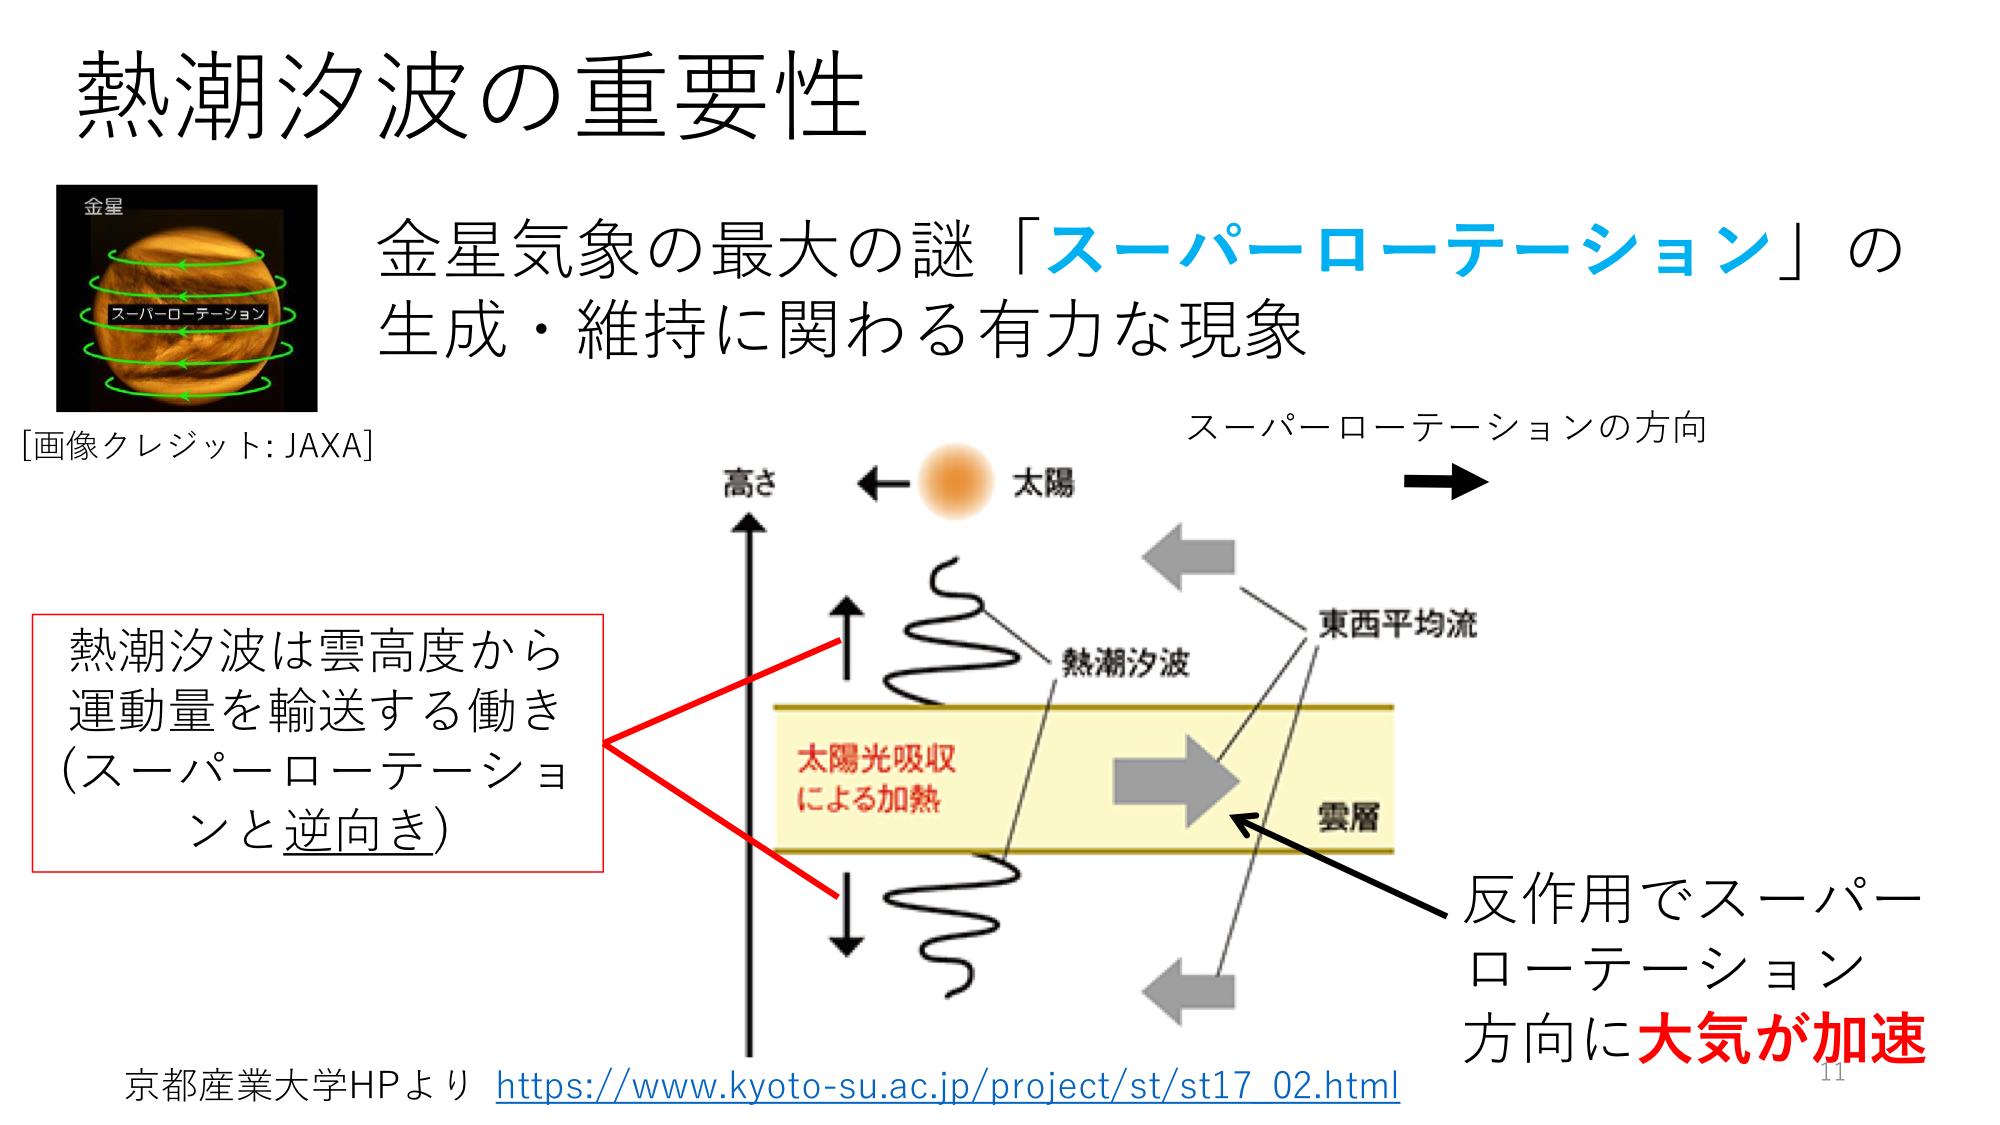 f:id:Imamura:20191119205438p:plain